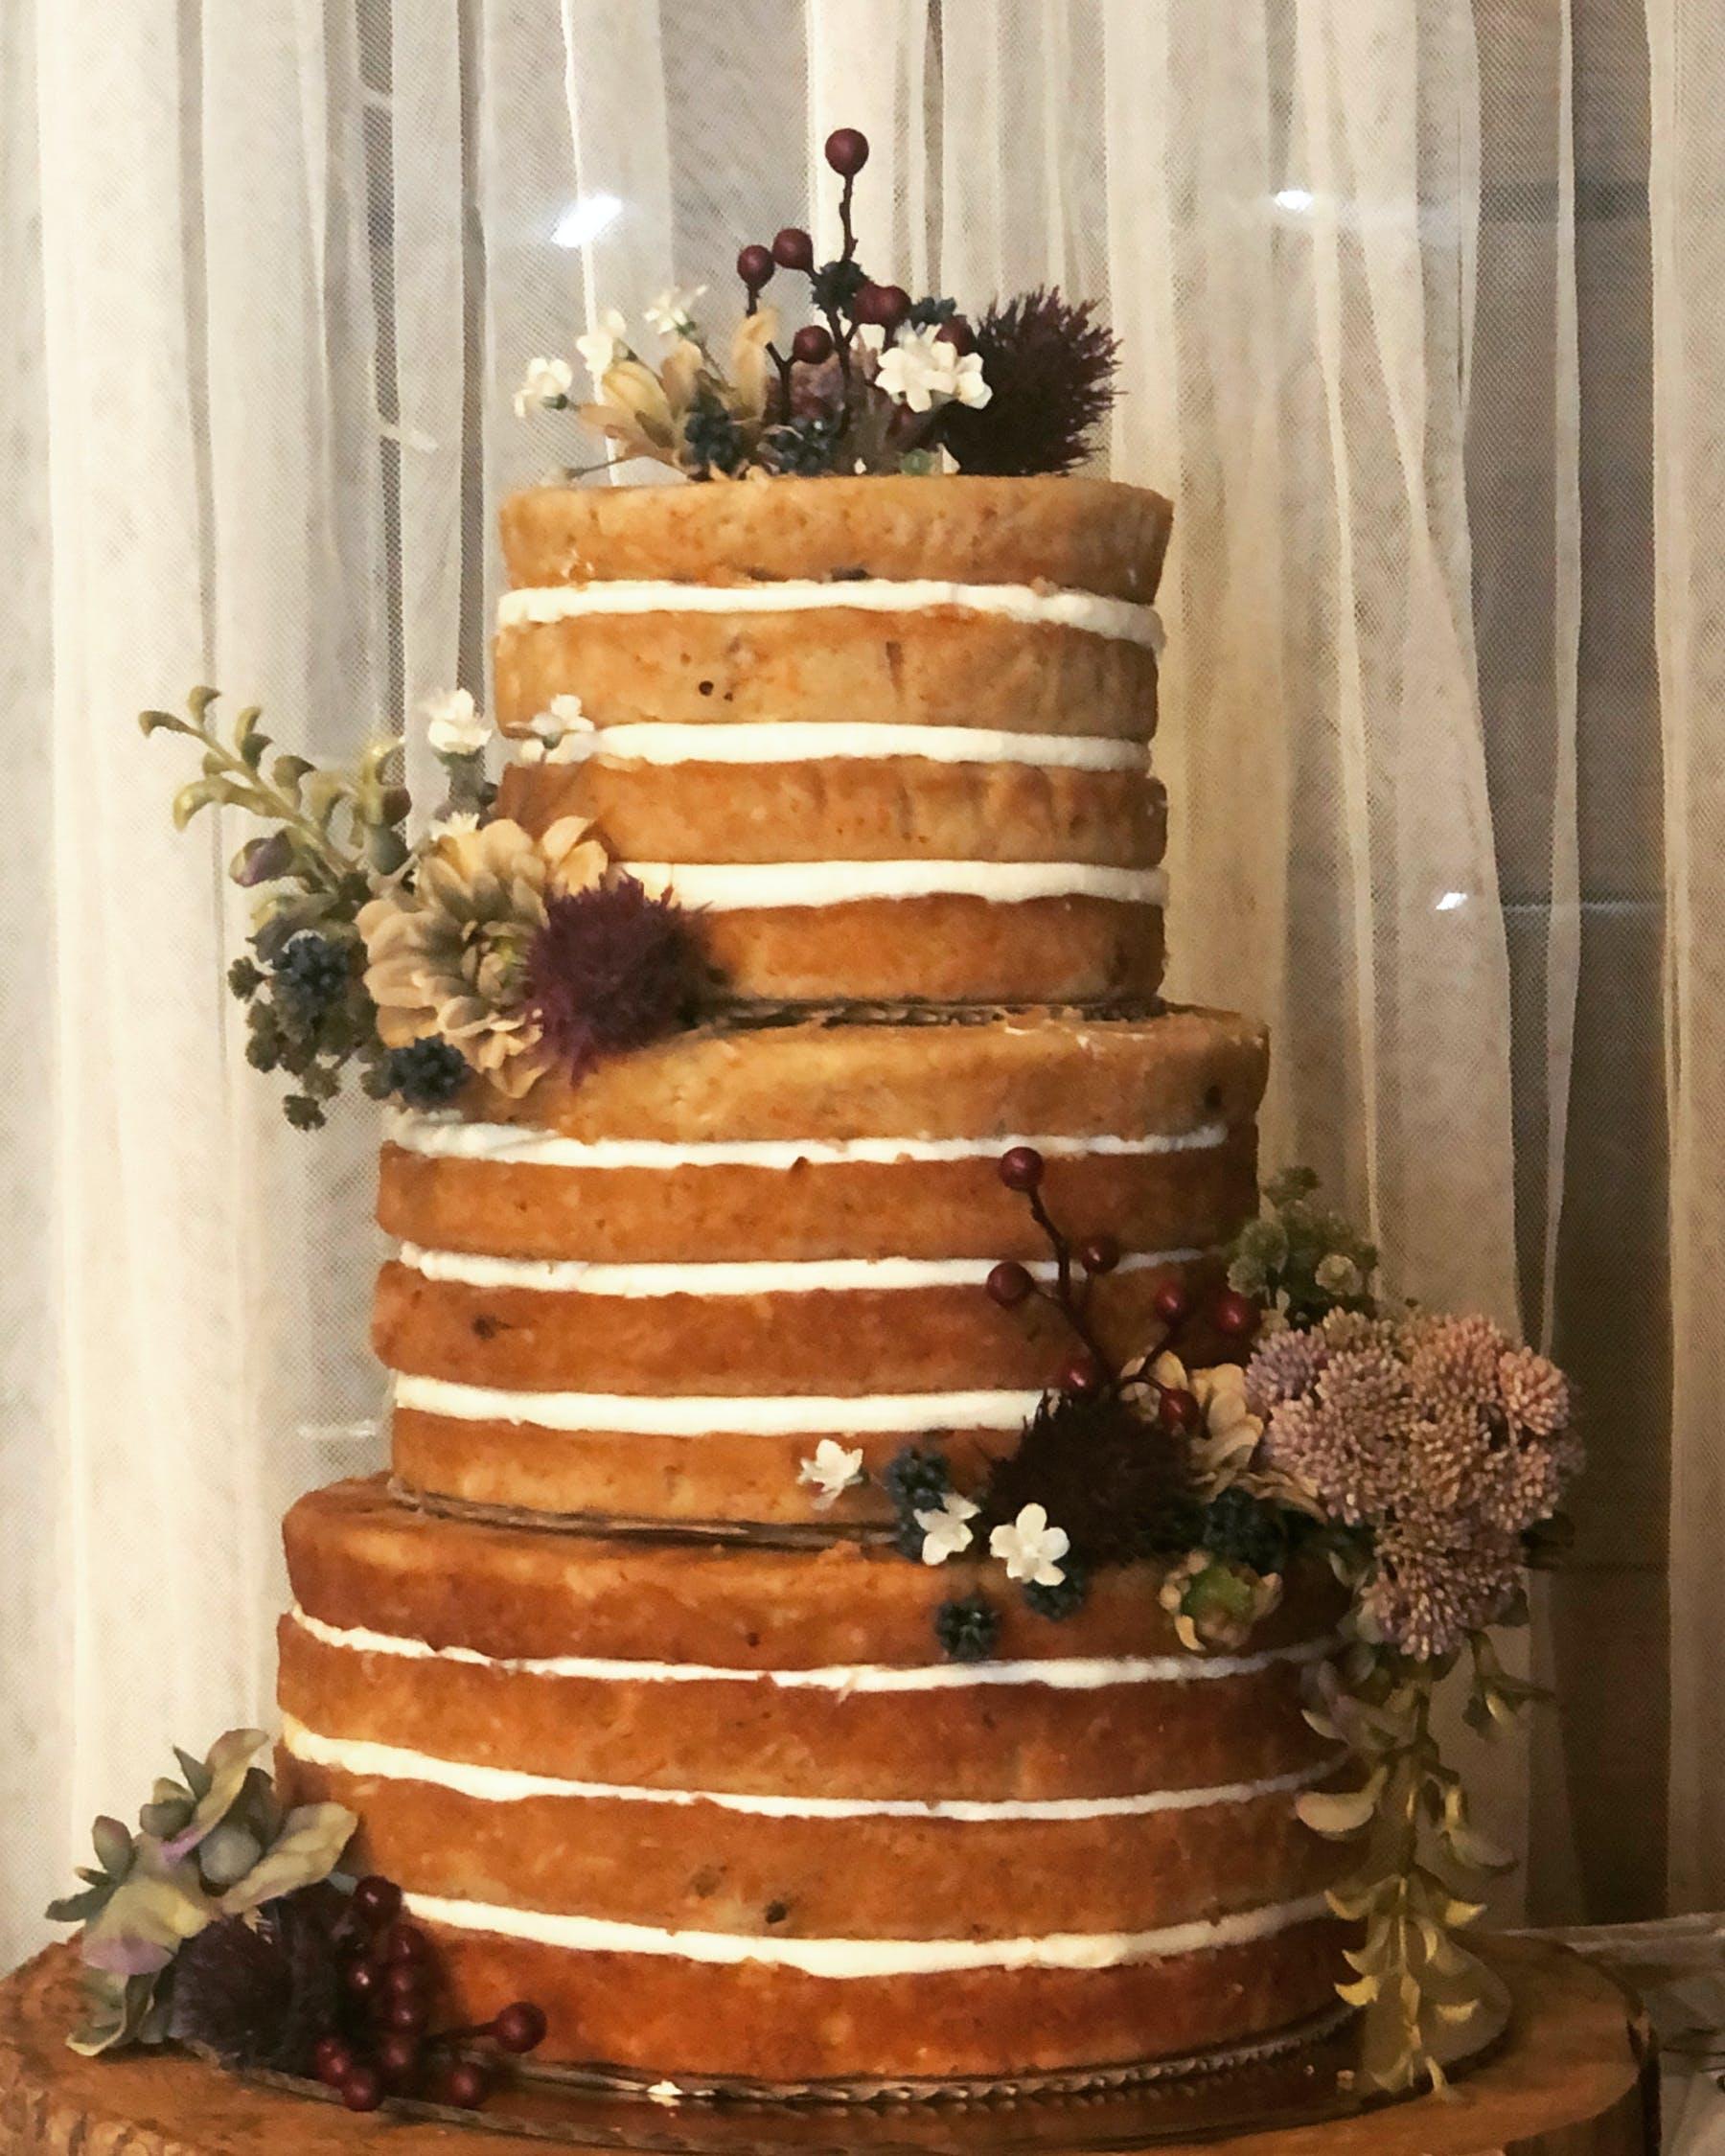 a cake made to look like a flower